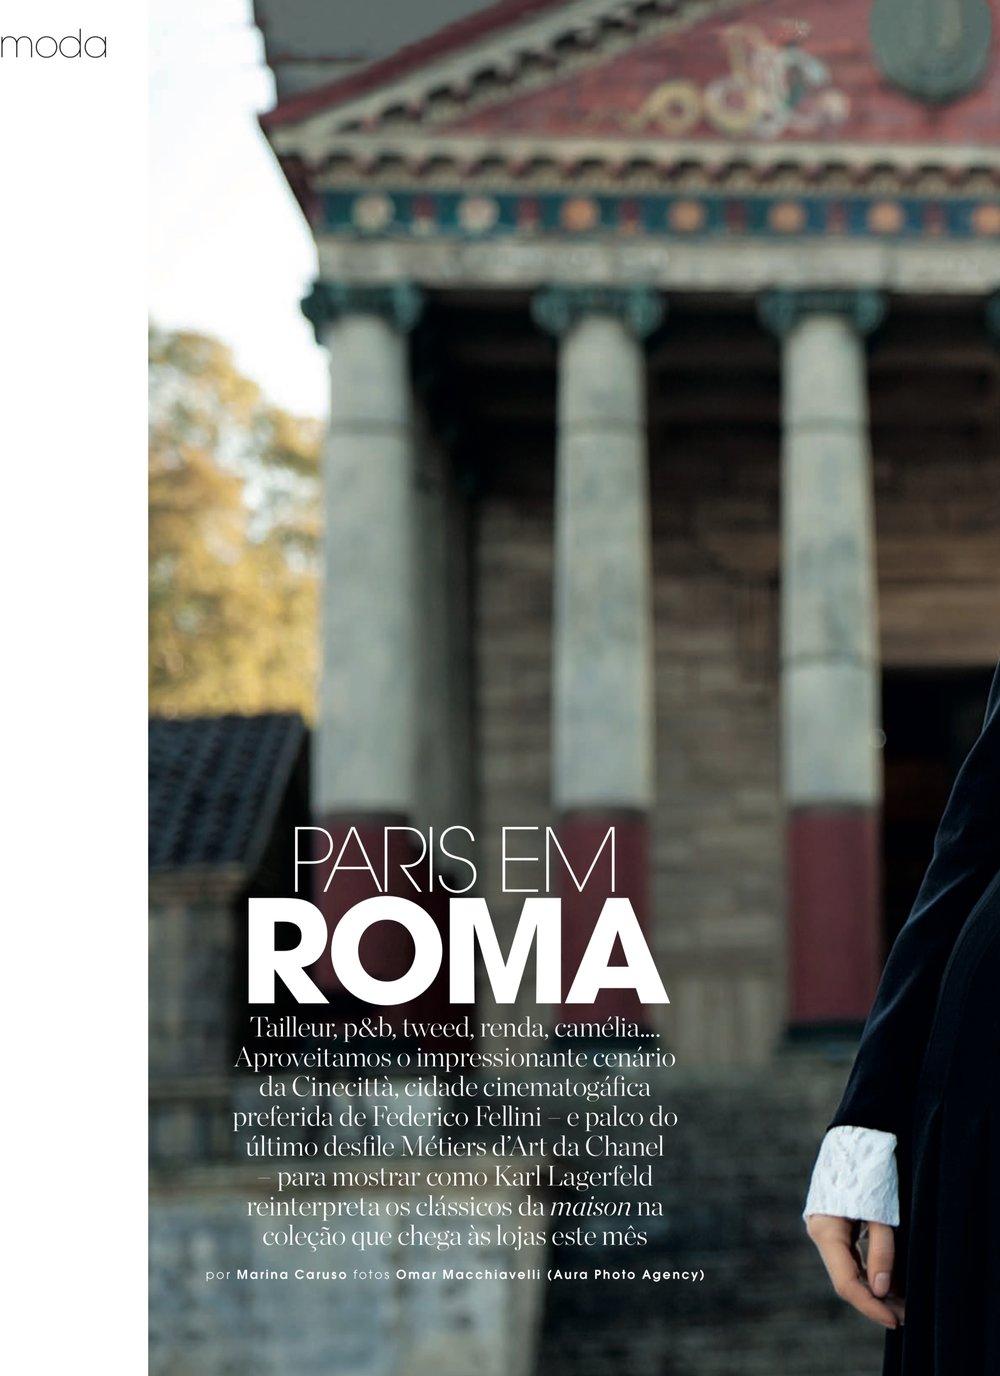 chanel paris rome-1_cropped (25).jpg